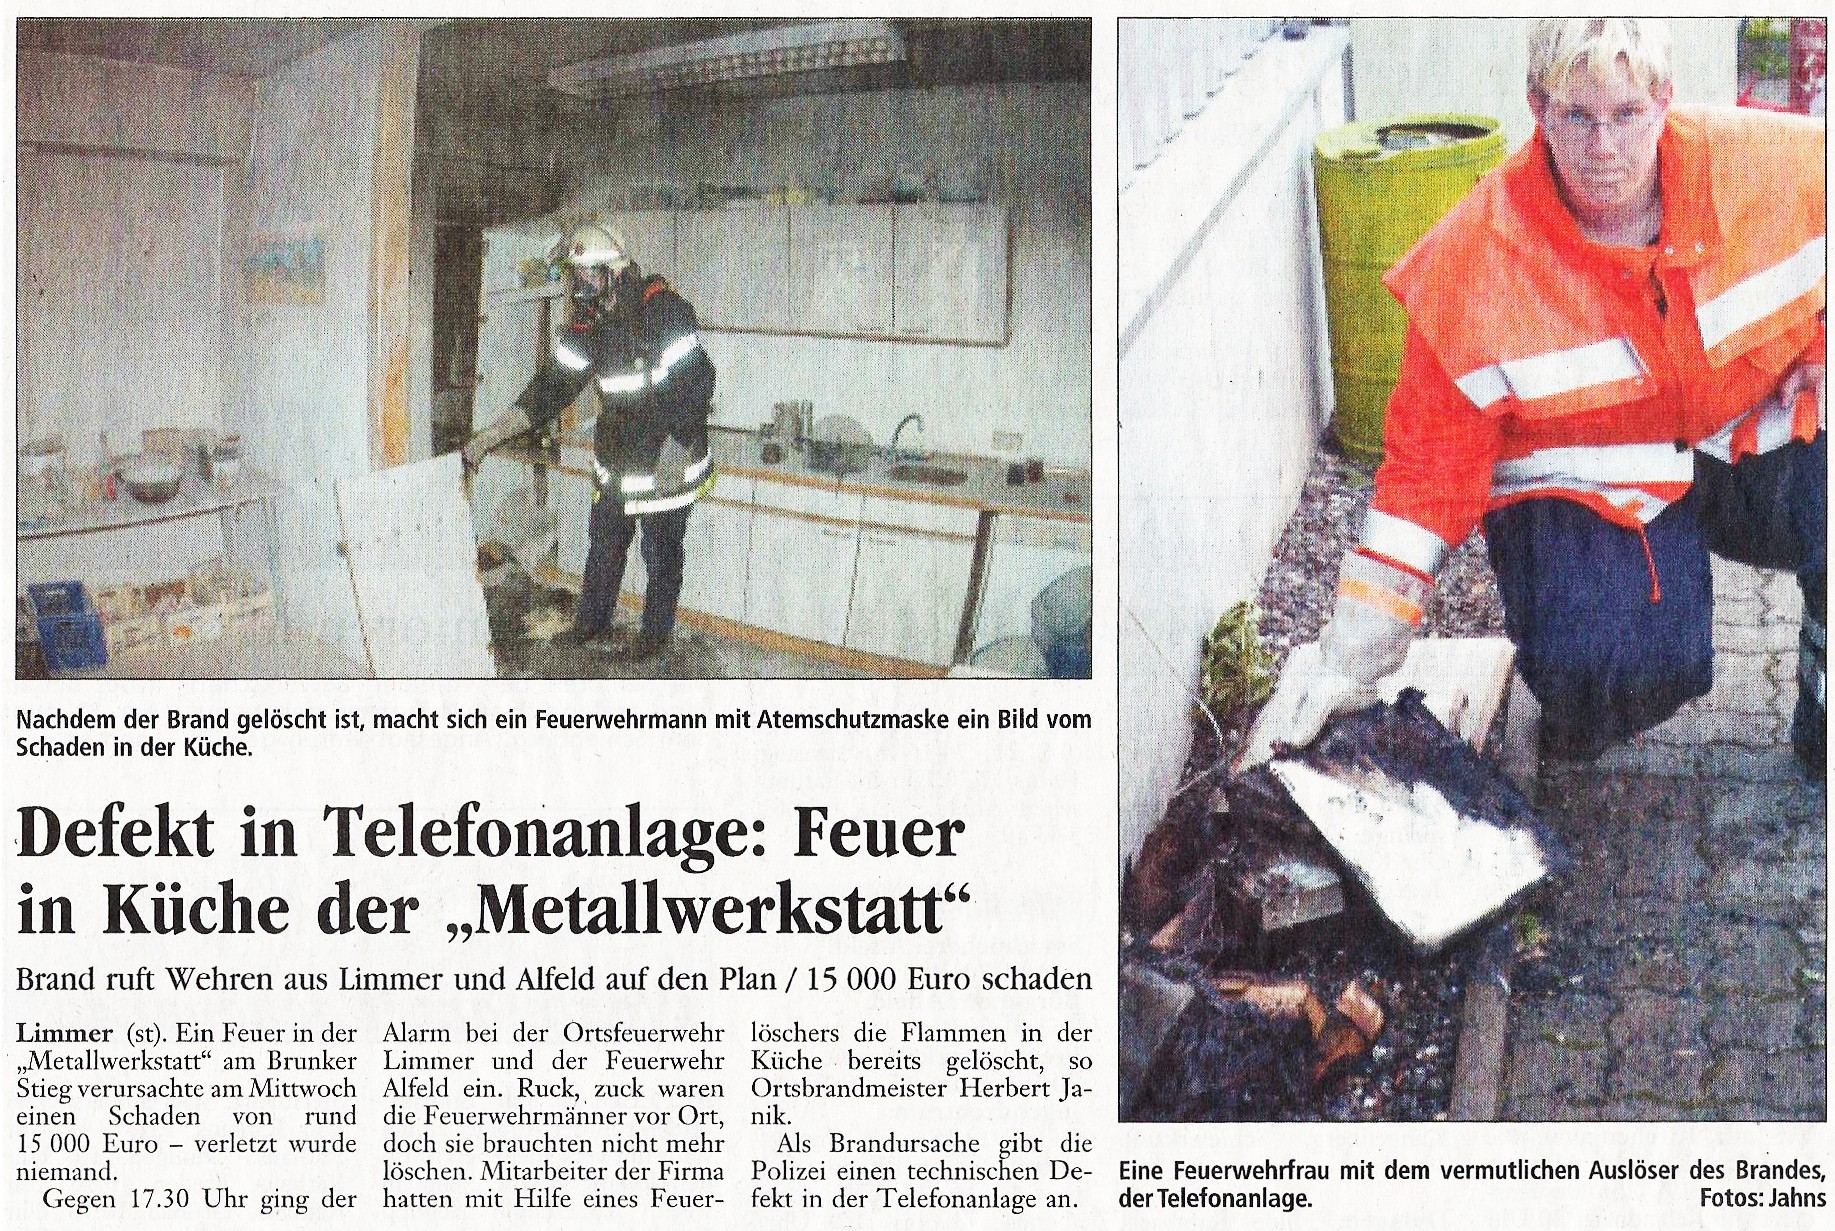 2003-06-27 Defekt in Telefonanlage